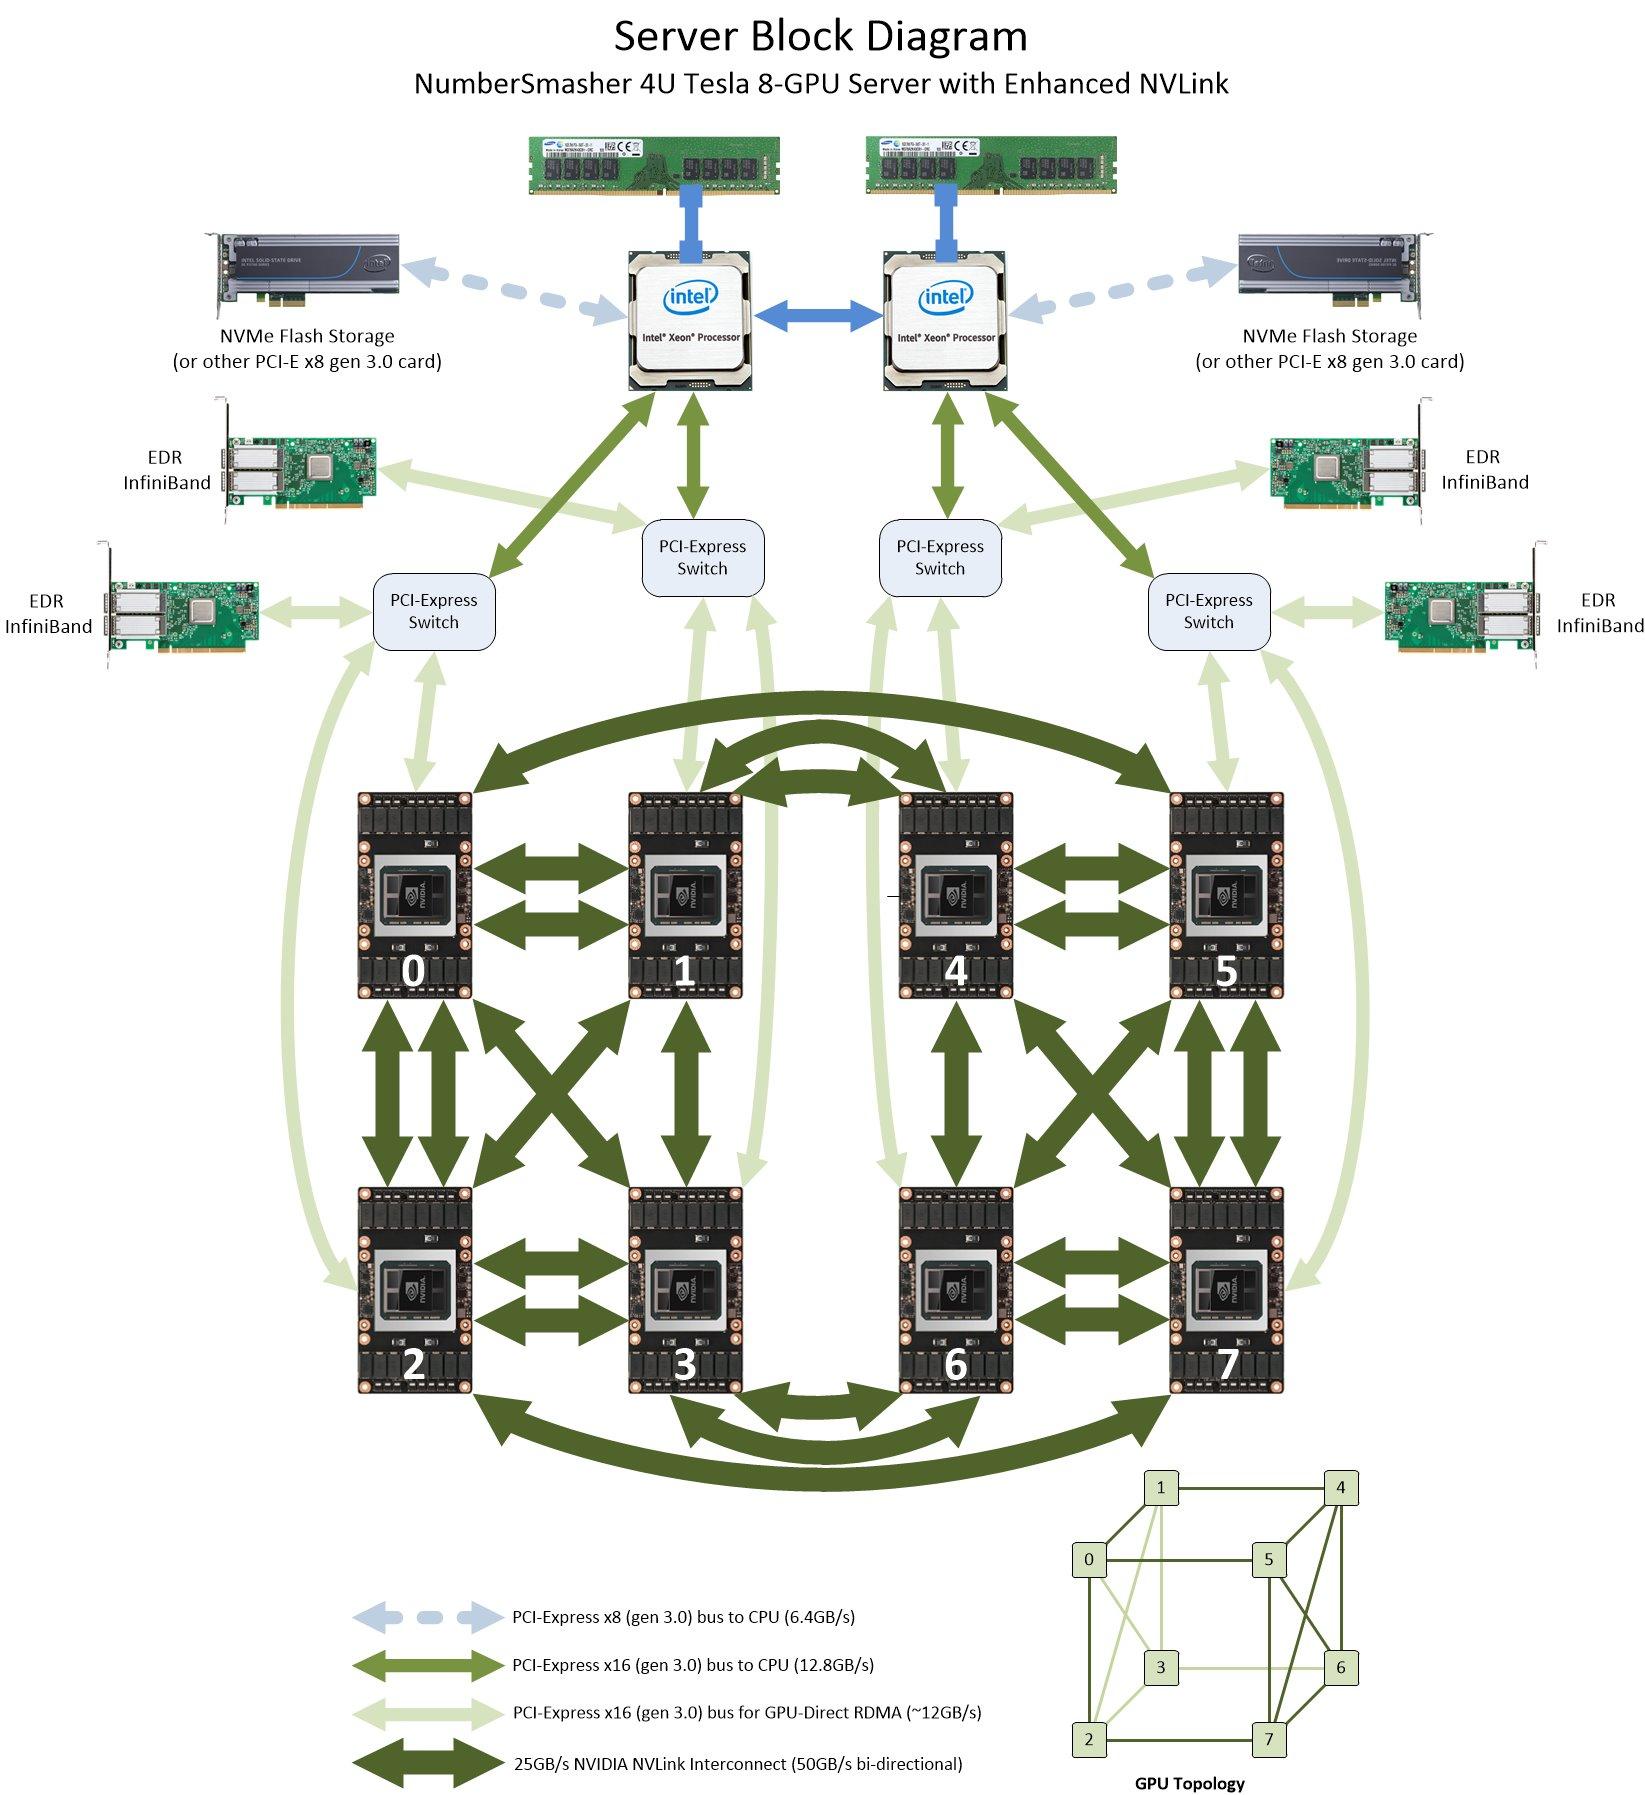 hight resolution of block diagram numbersmasher 4u gpu server with enhanced nvlink 4028gr tvxrt